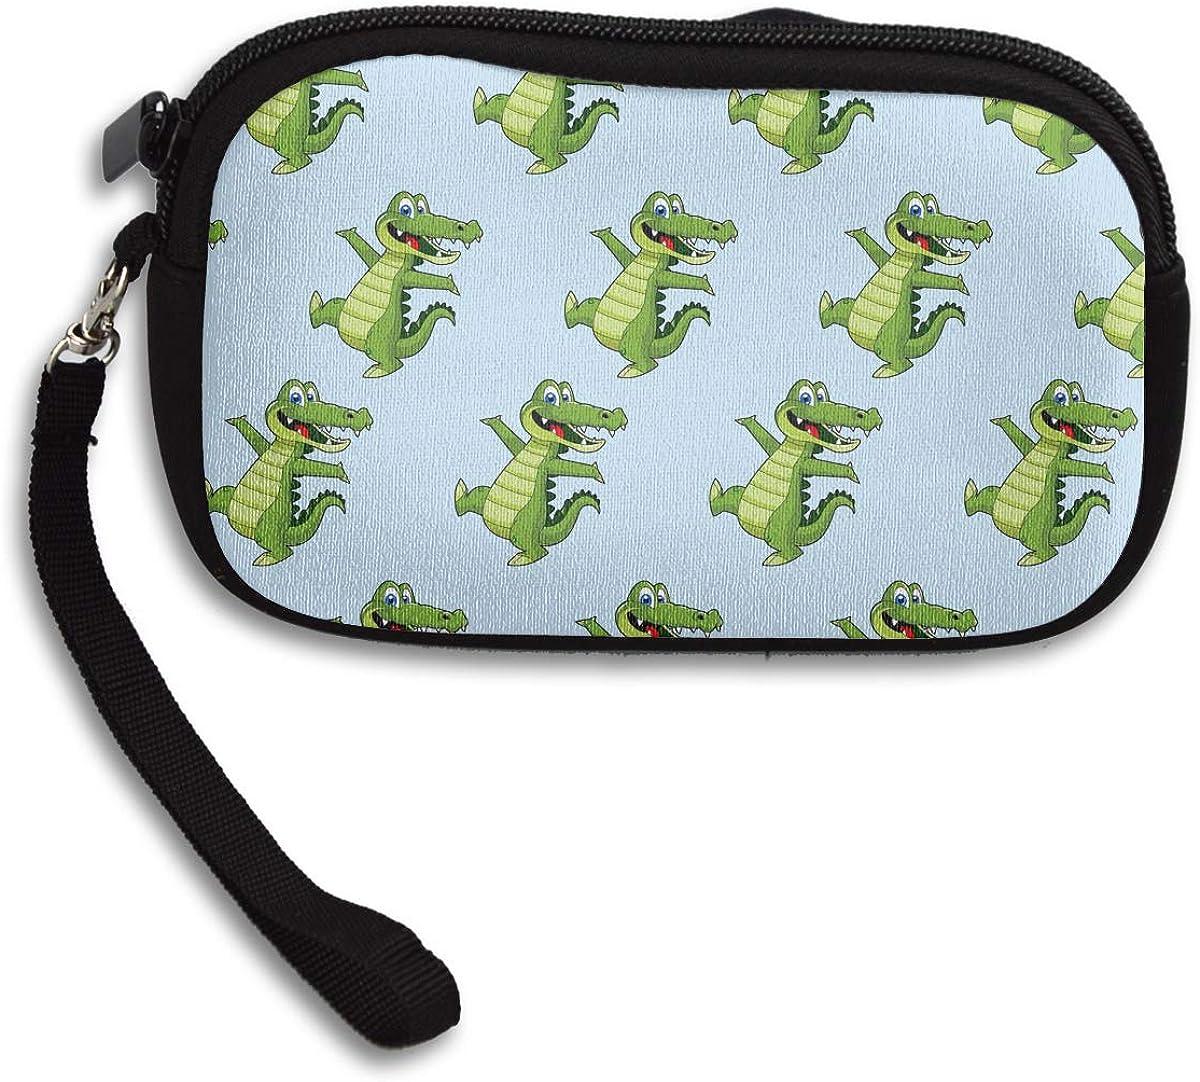 Womens Clutch Wallet Alligator Pattern Cell Phone Handbag Tote Purse//Luxury Clutch Wallet Handbag Ladies Clutch Purse Extra Capacity Evening Purse